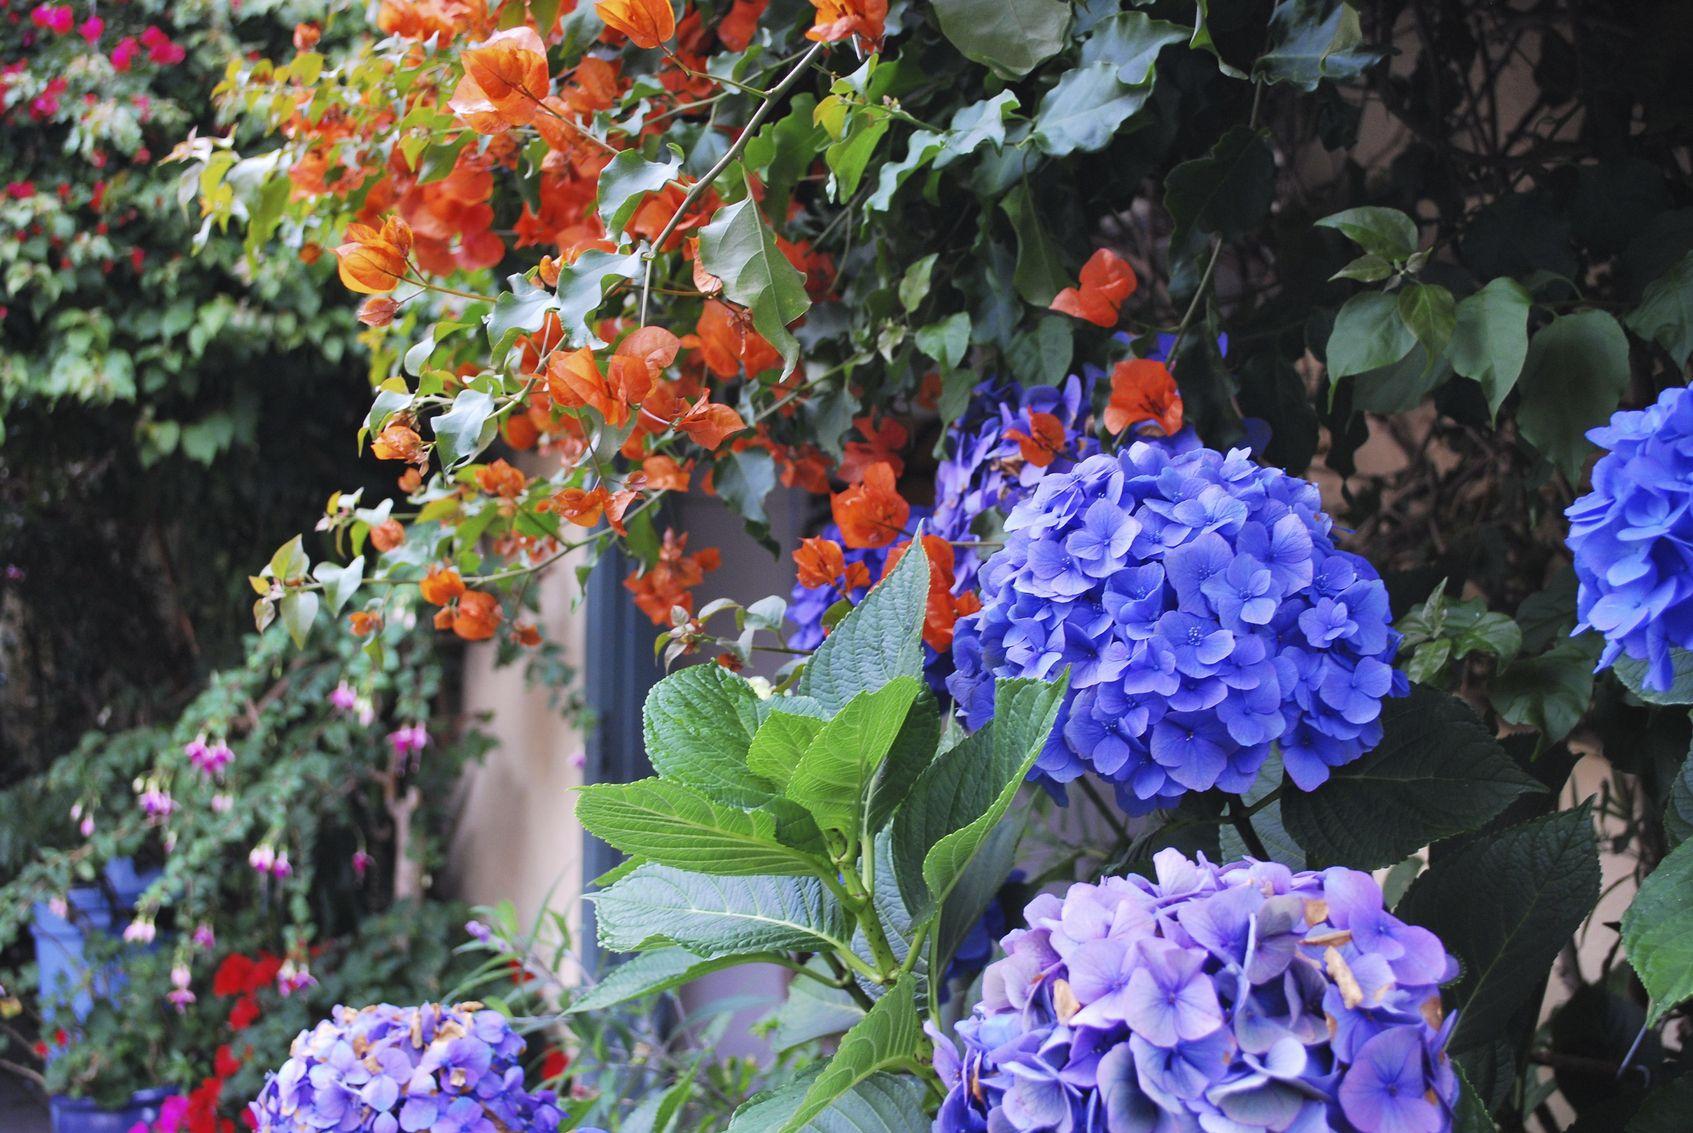 Hydrangea Plant Companions Tips On Planting Next To Hydrangeas Planting Hydrangeas Hydrangea Landscaping Garden Shrubs